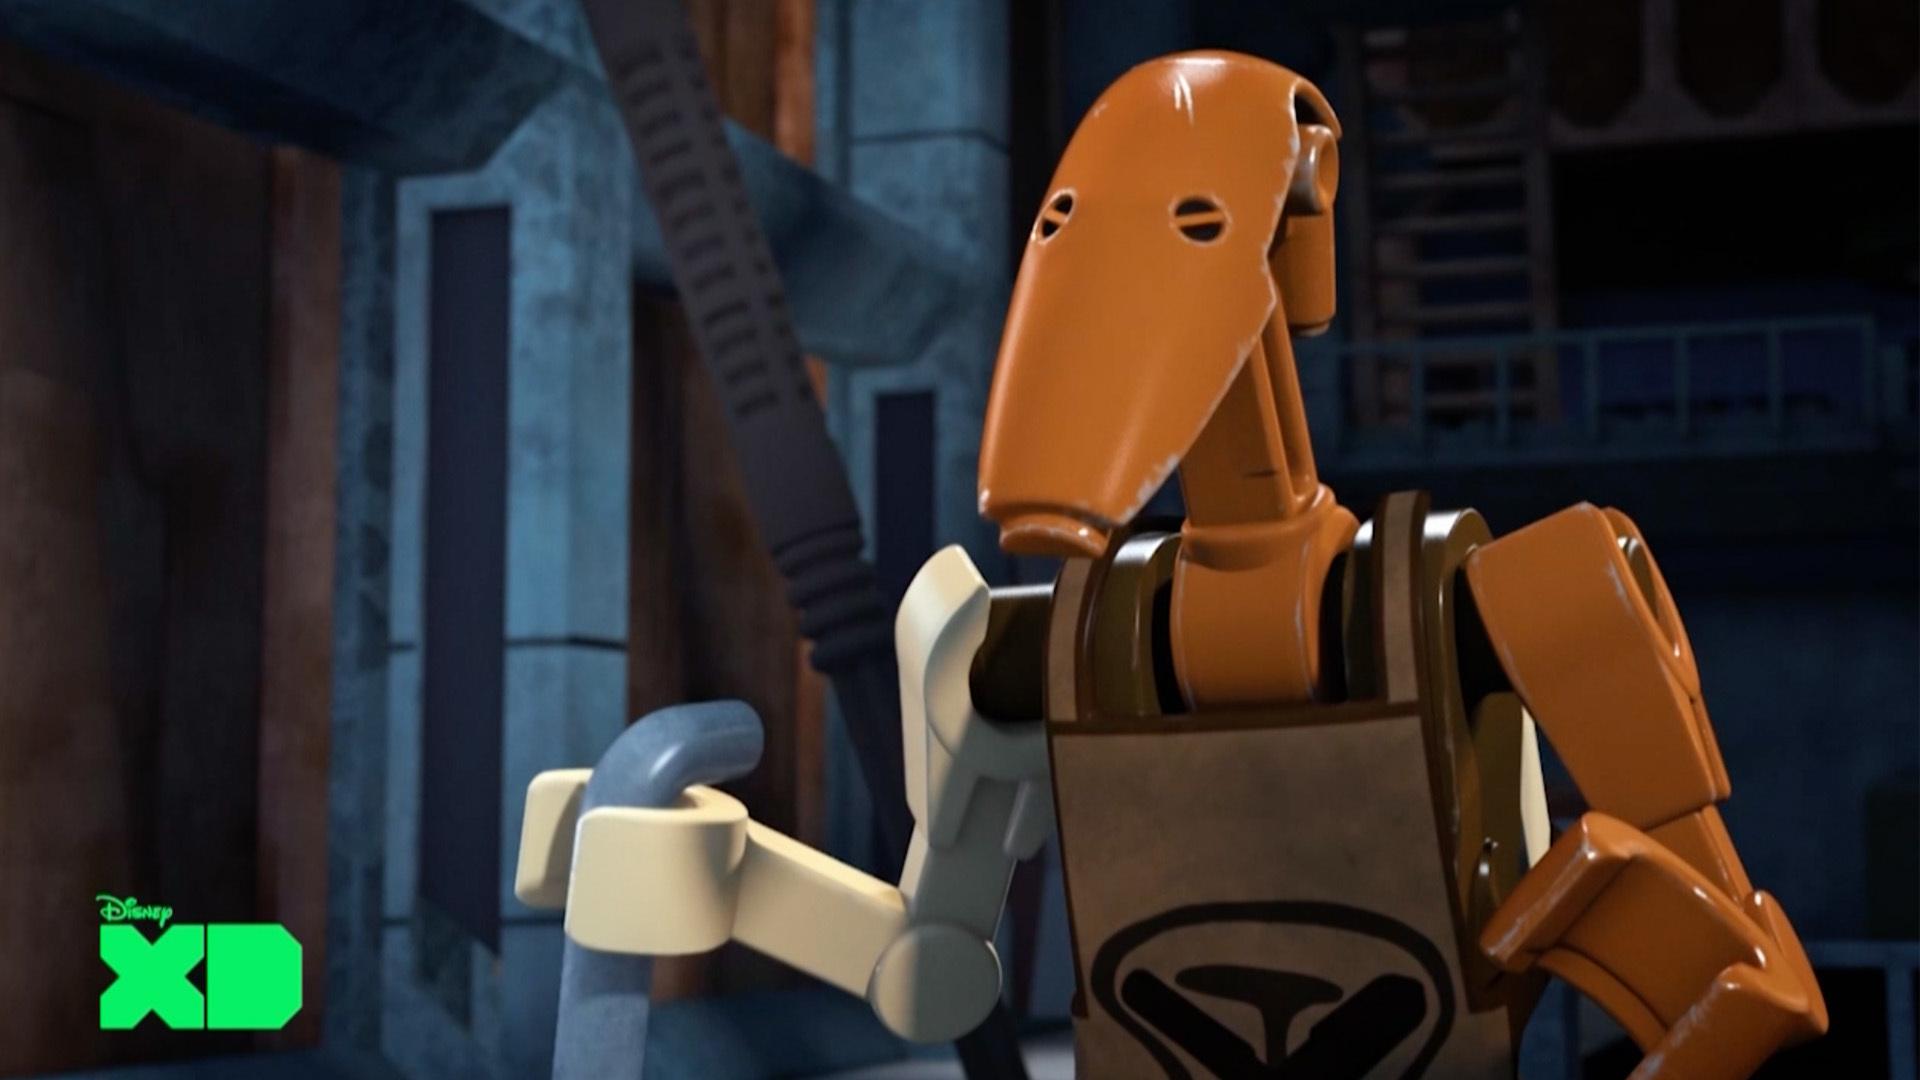 Roger droid lokajowy